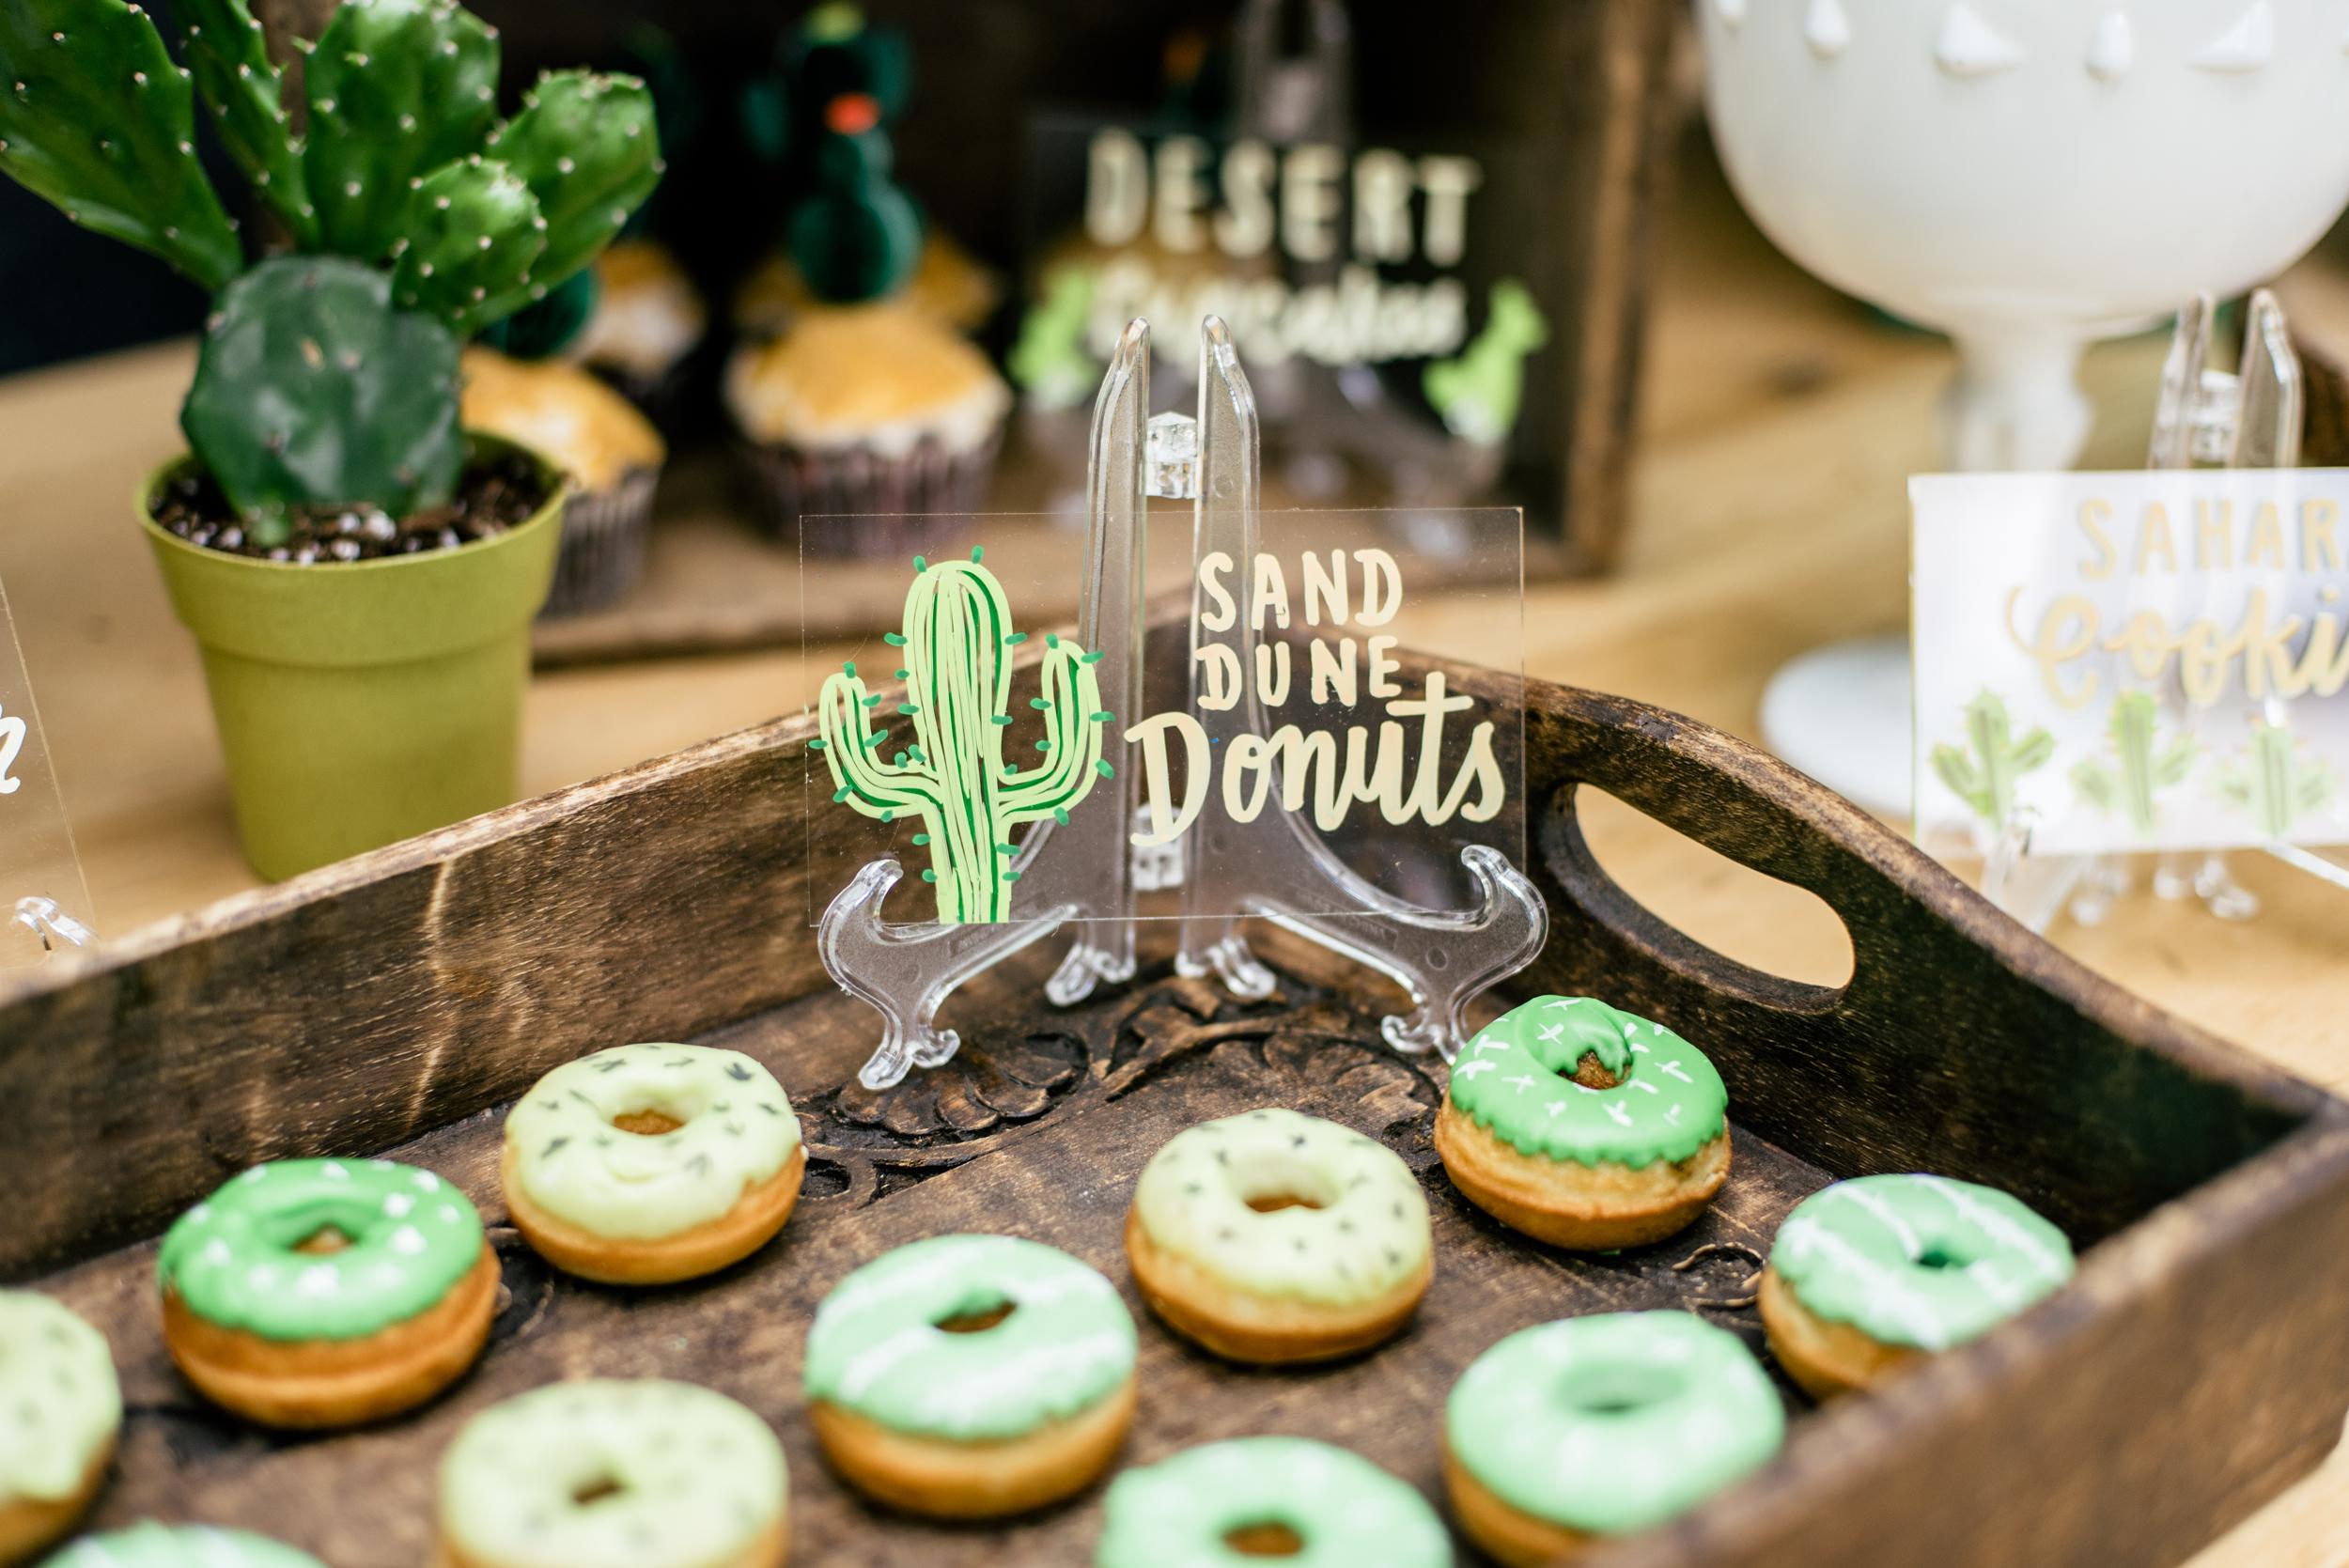 desert-desserts-party-16.jpg